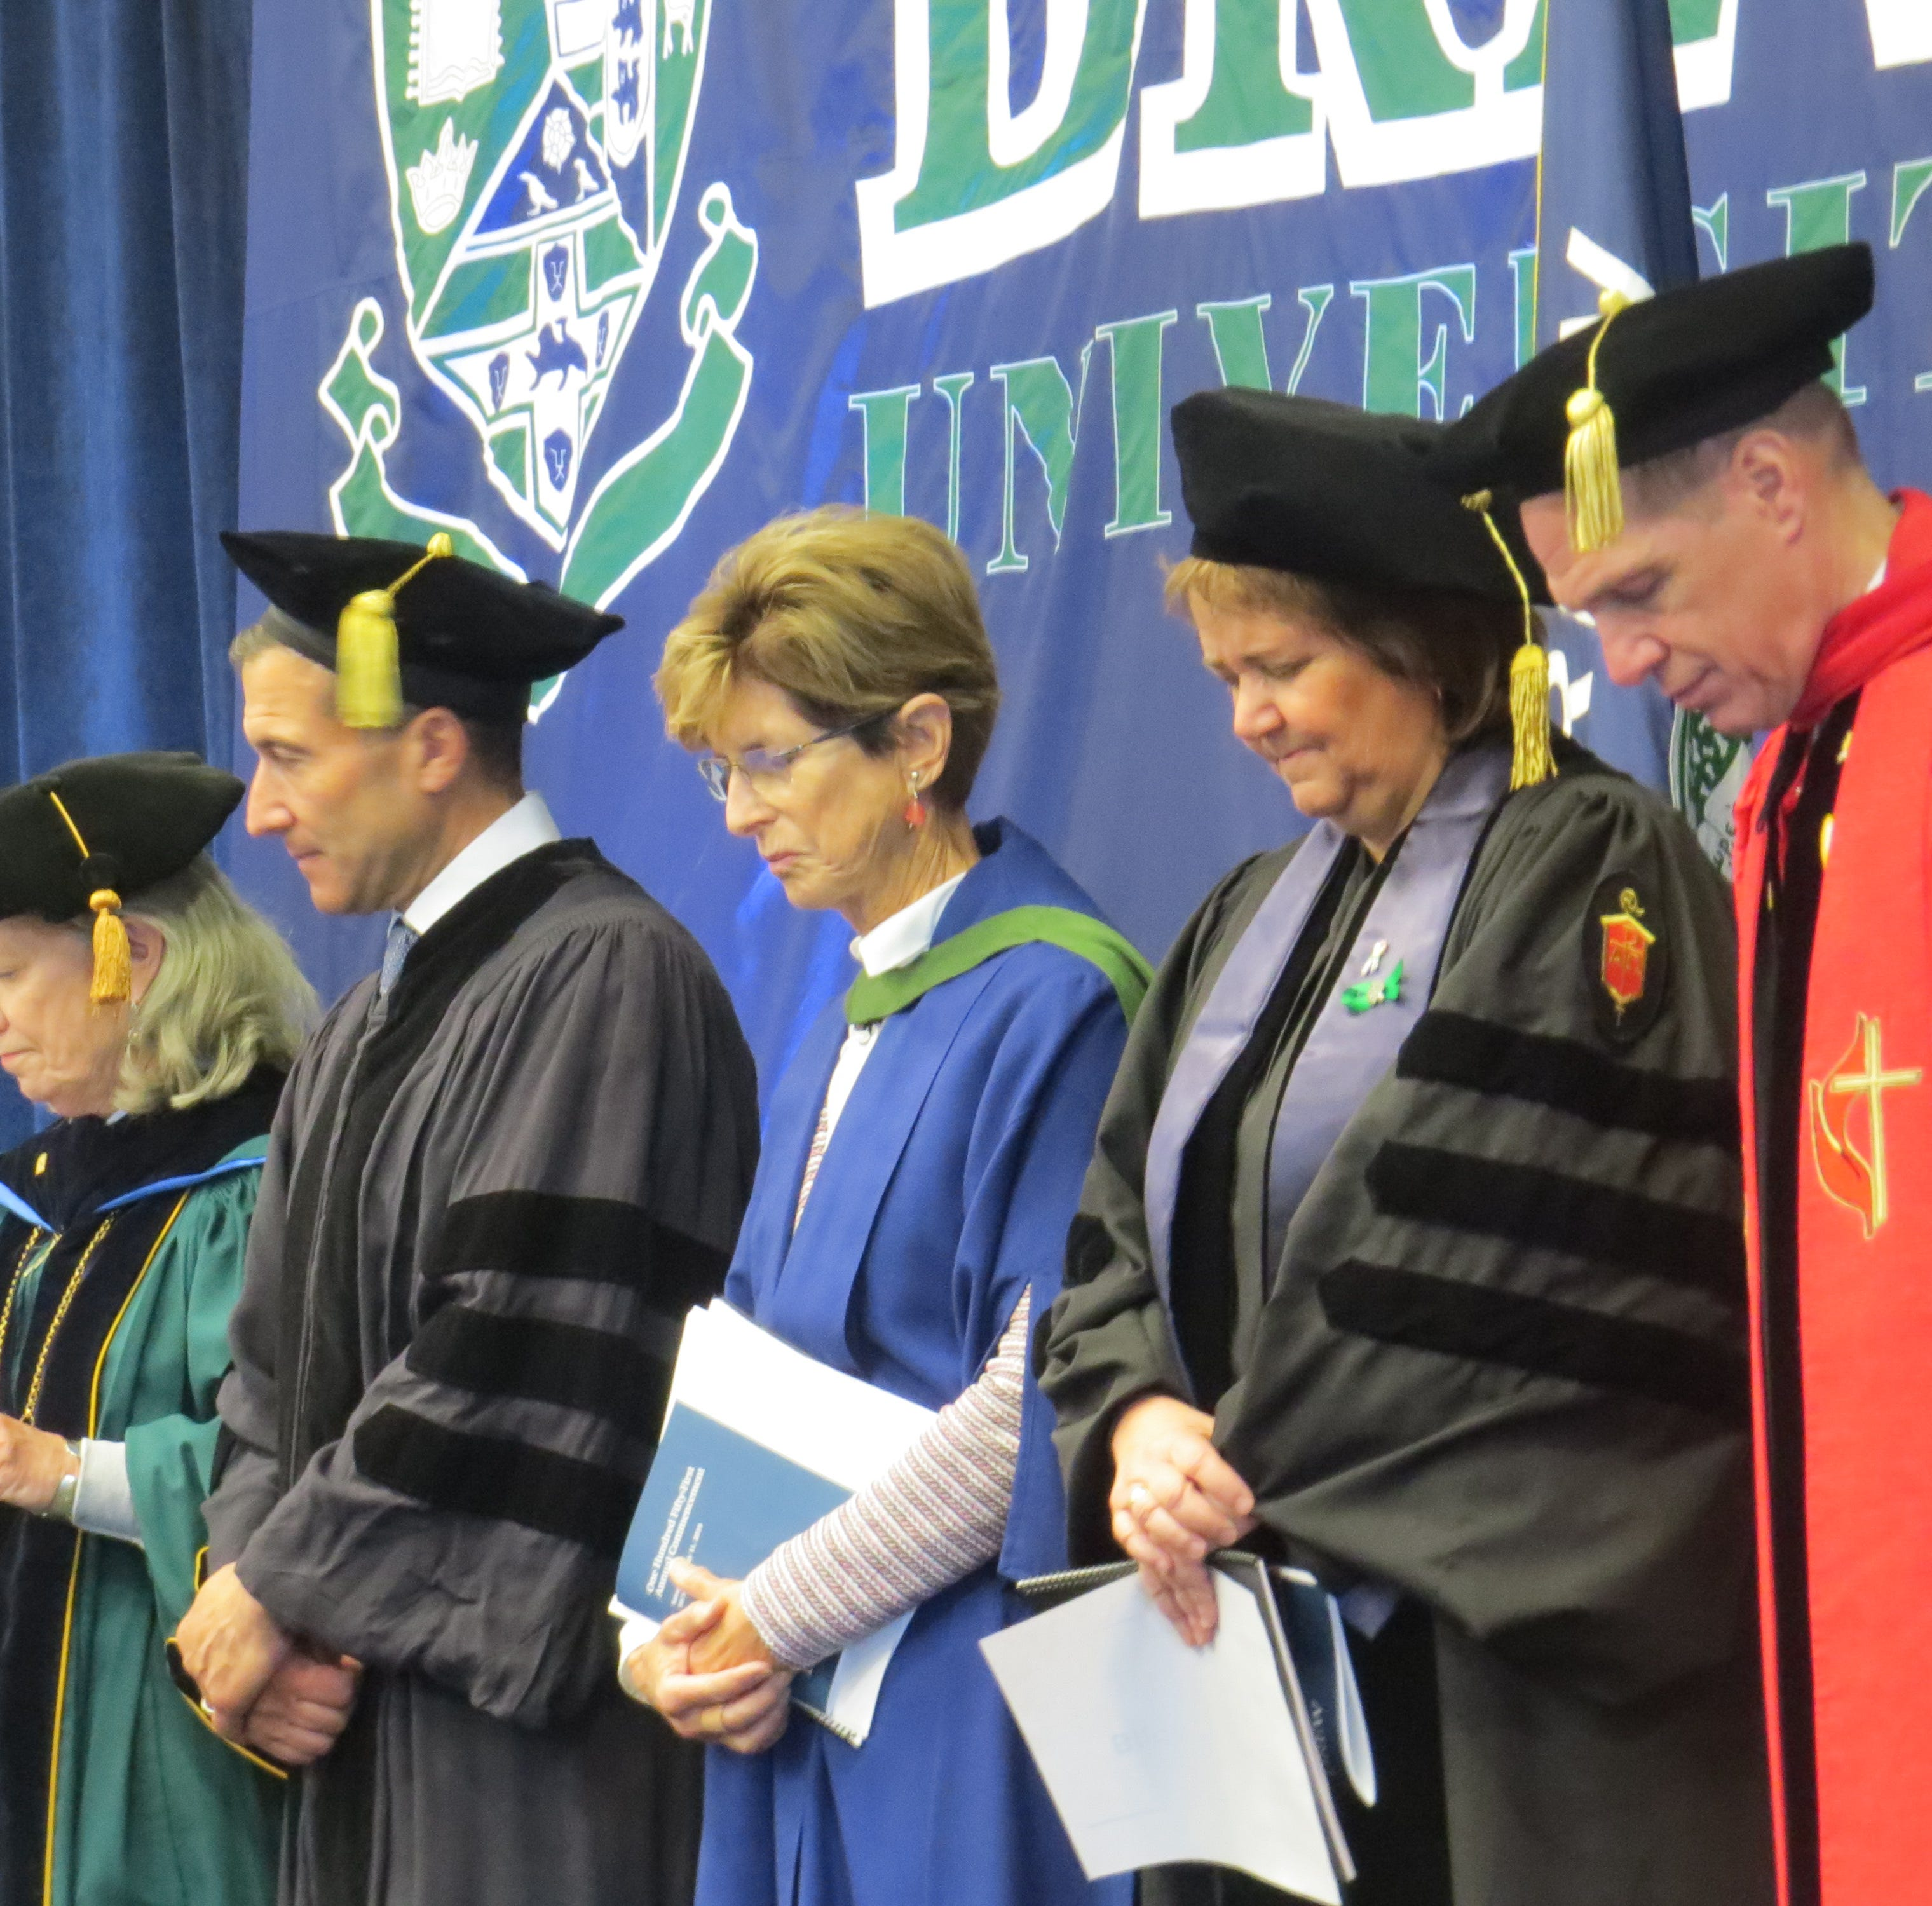 Drew, St. Elizabeth graduates receive degrees, challenges